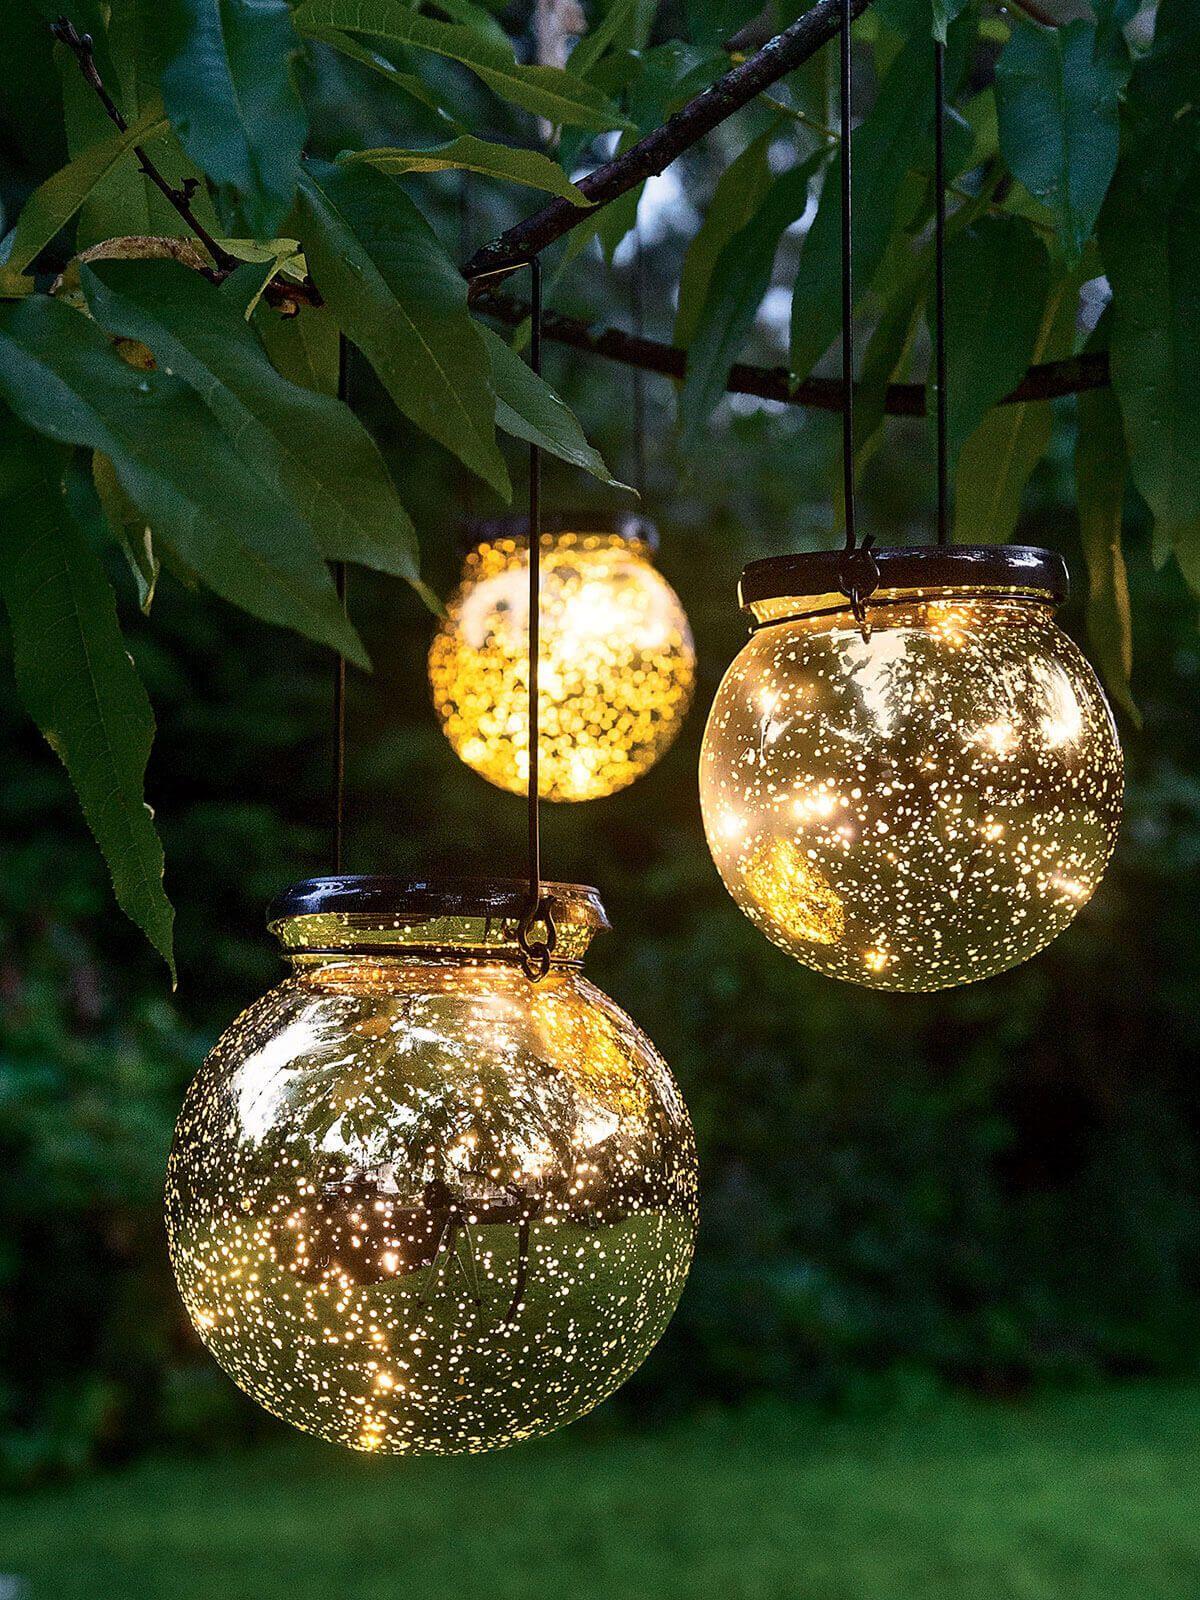 25 awesome lighting ideas to beautify your backyard 3f rh pinterest com